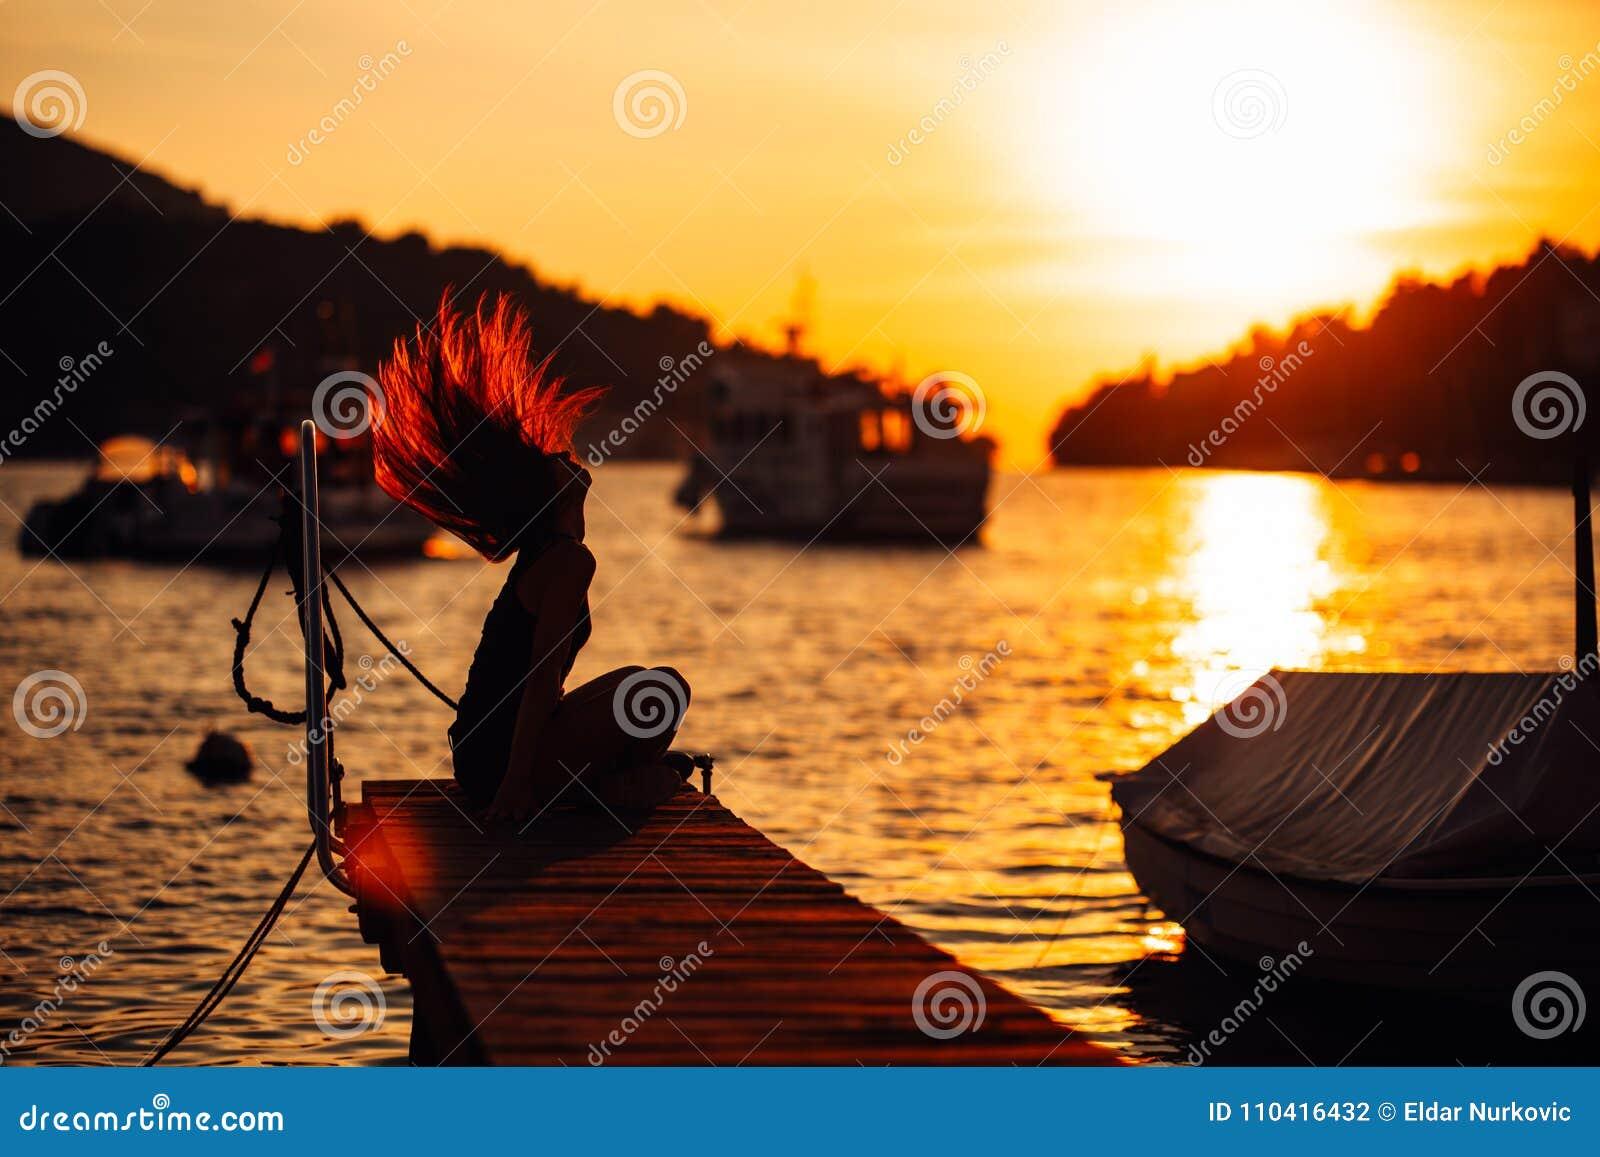 Sensual carefree summer woman enjoying vacation.Seaside stress less lifestyle.Fit traveler enjoying life.Full of energy.Energetic